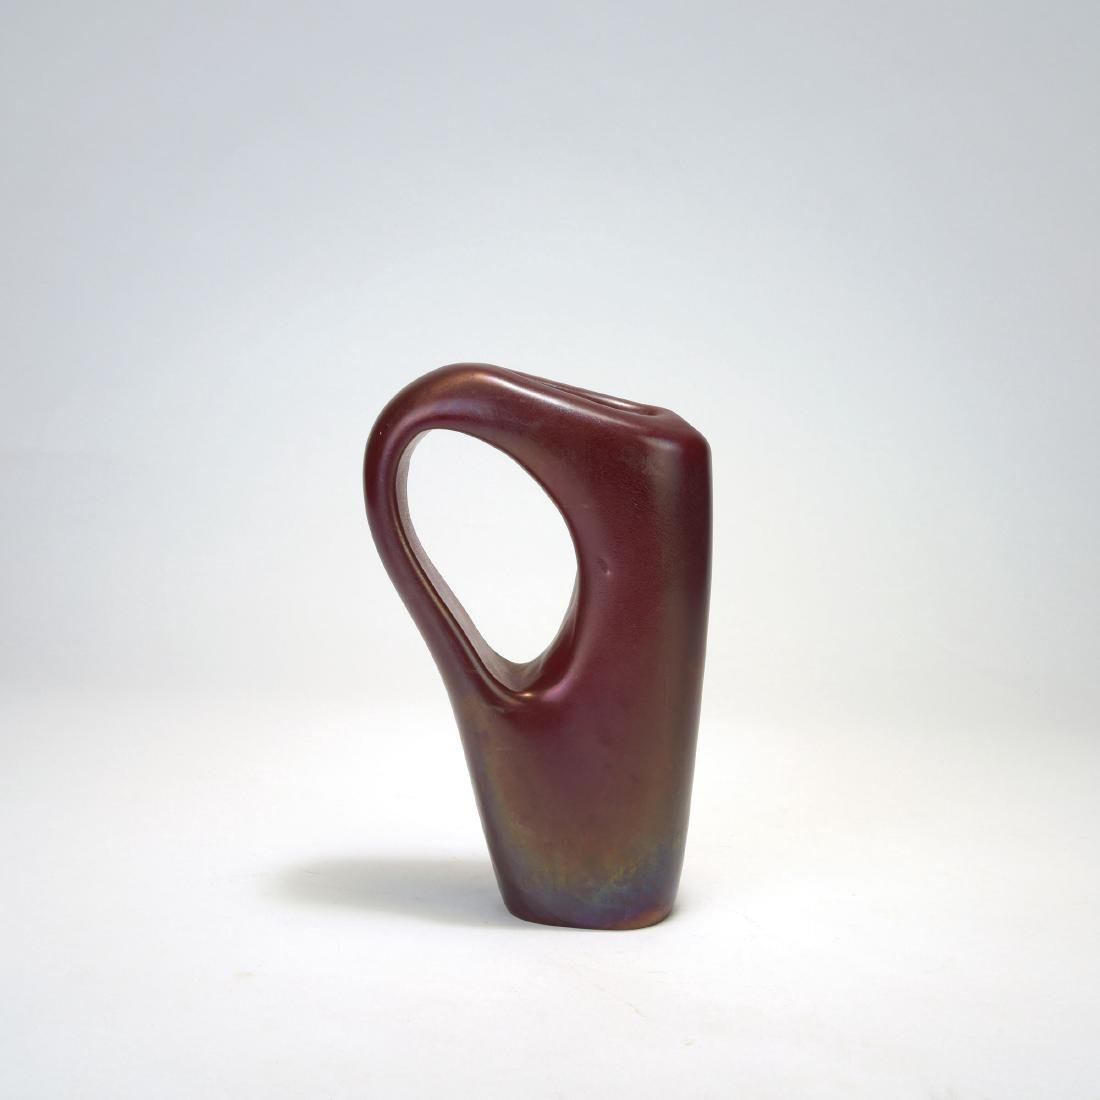 'Anse volante' vase, c1952 - 2